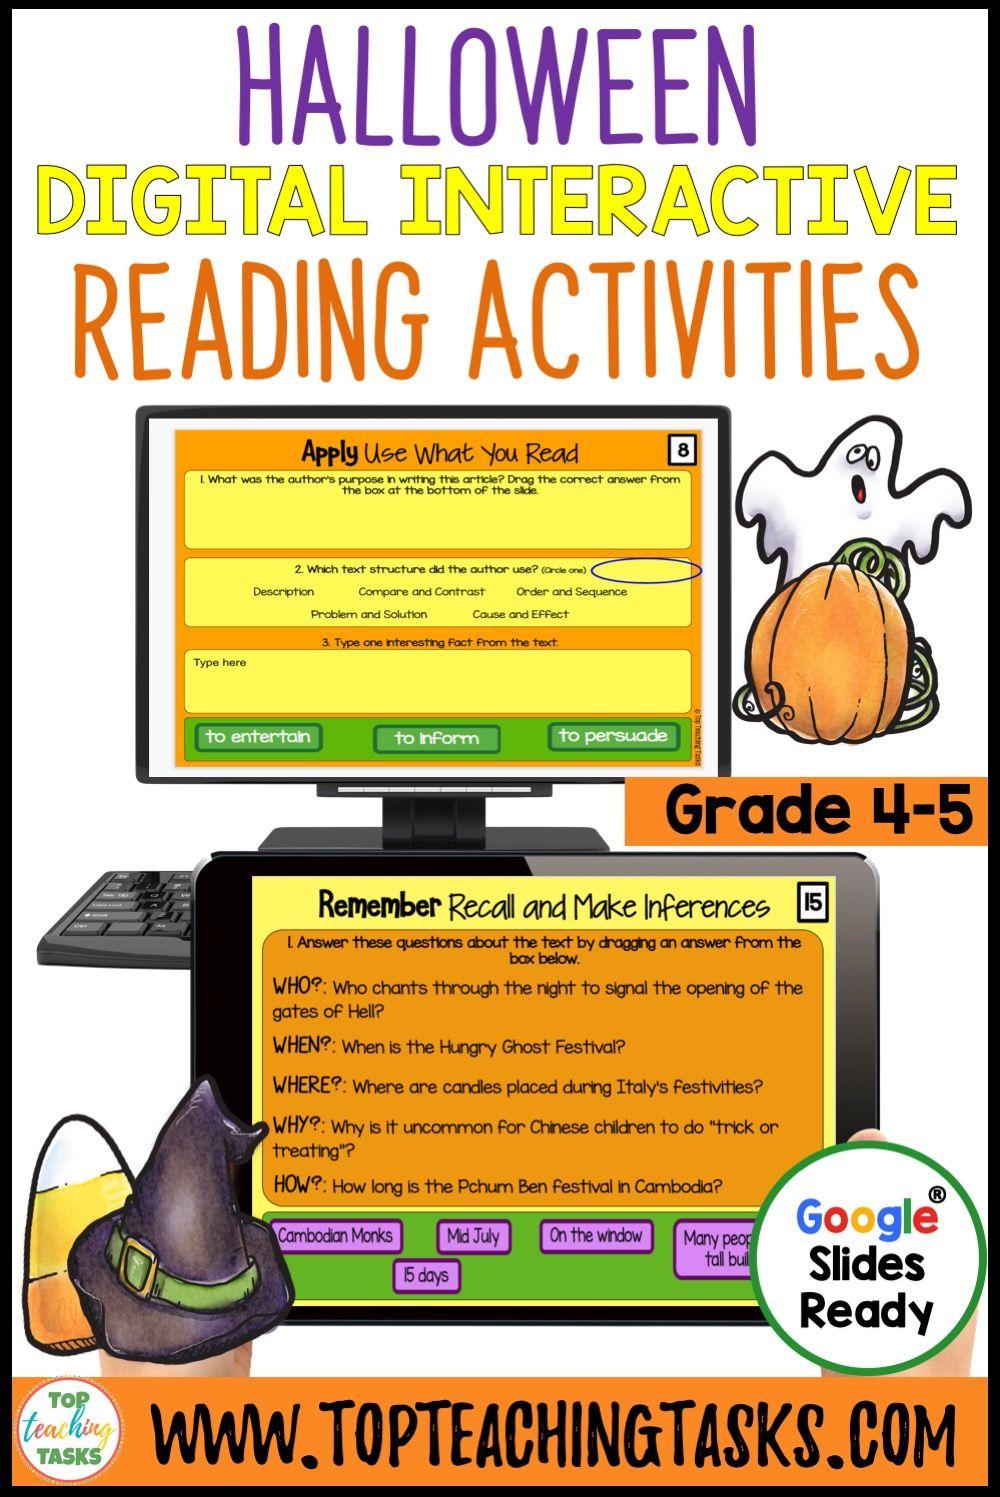 Halloween Digital Reading Comprehension Activity For Google Slides Fall Reading Comprehension Activities Reading Comprehension Resources Reading Comprehension [ 1497 x 1000 Pixel ]